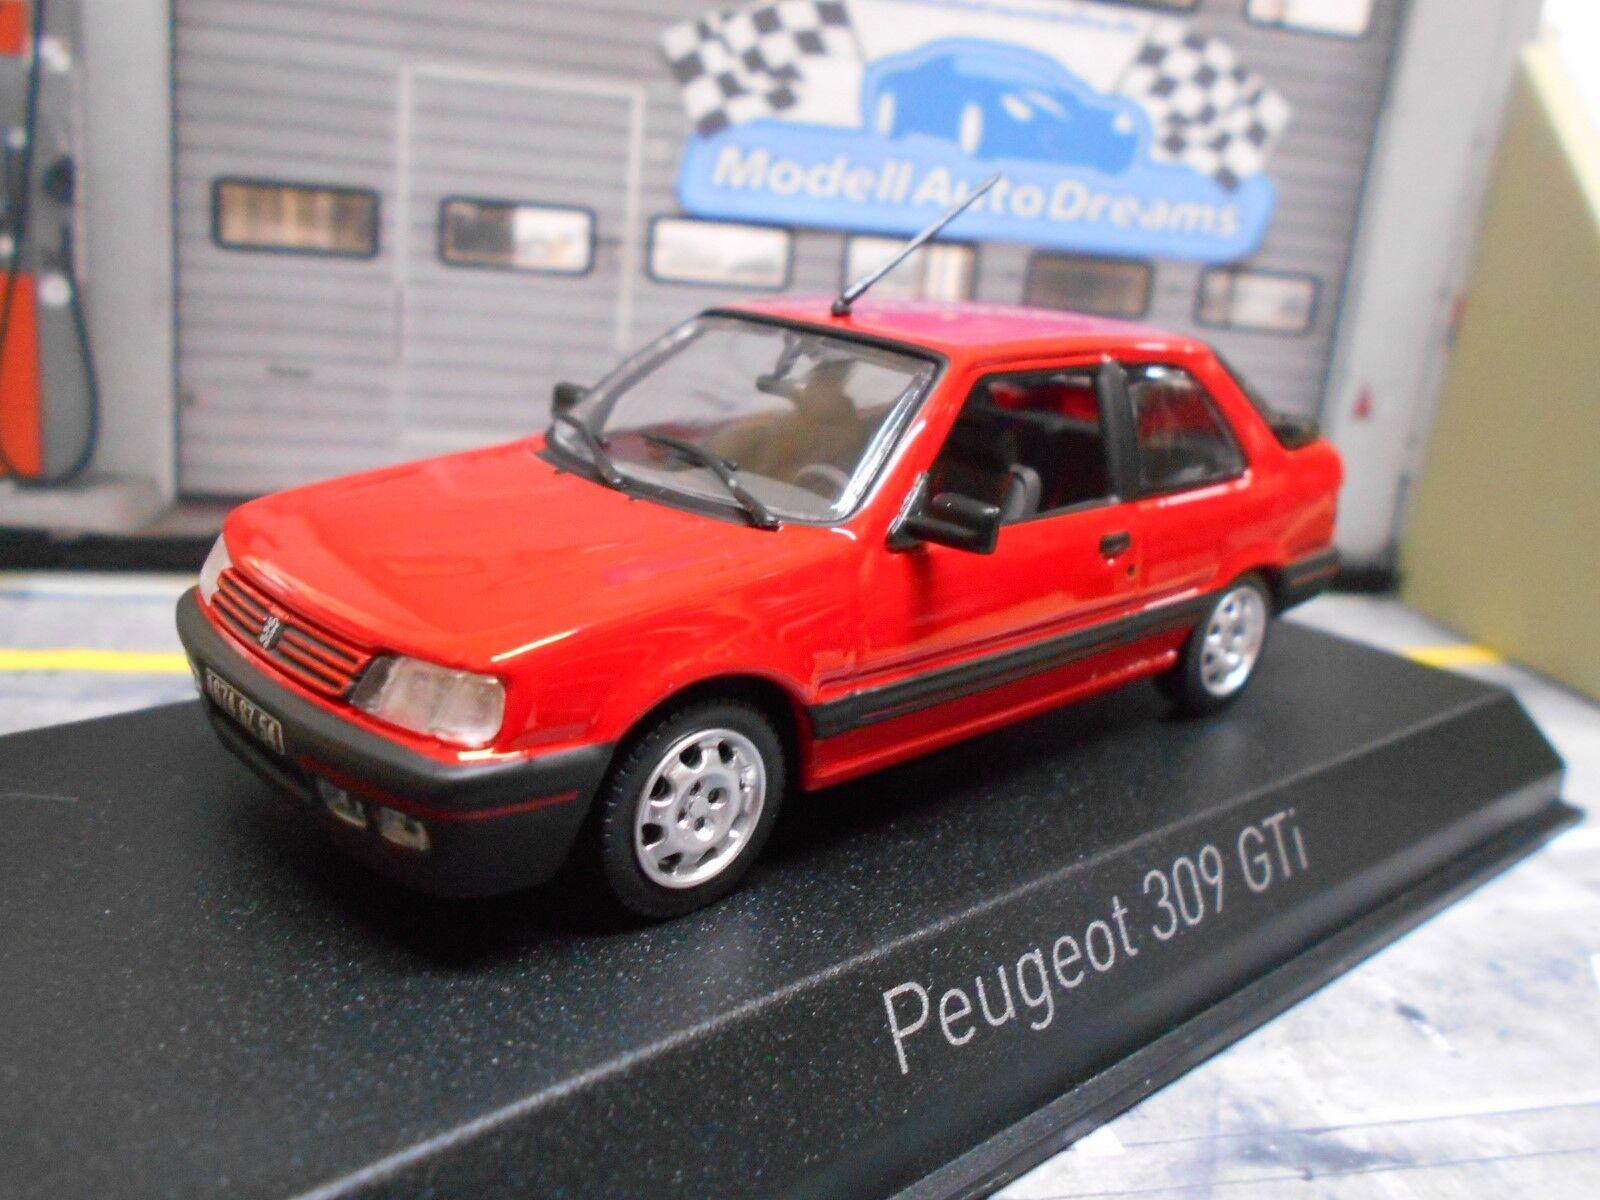 PEUGEOT 309 GTI Sport 1987 rouge Rouge NOREV neuf 1 43